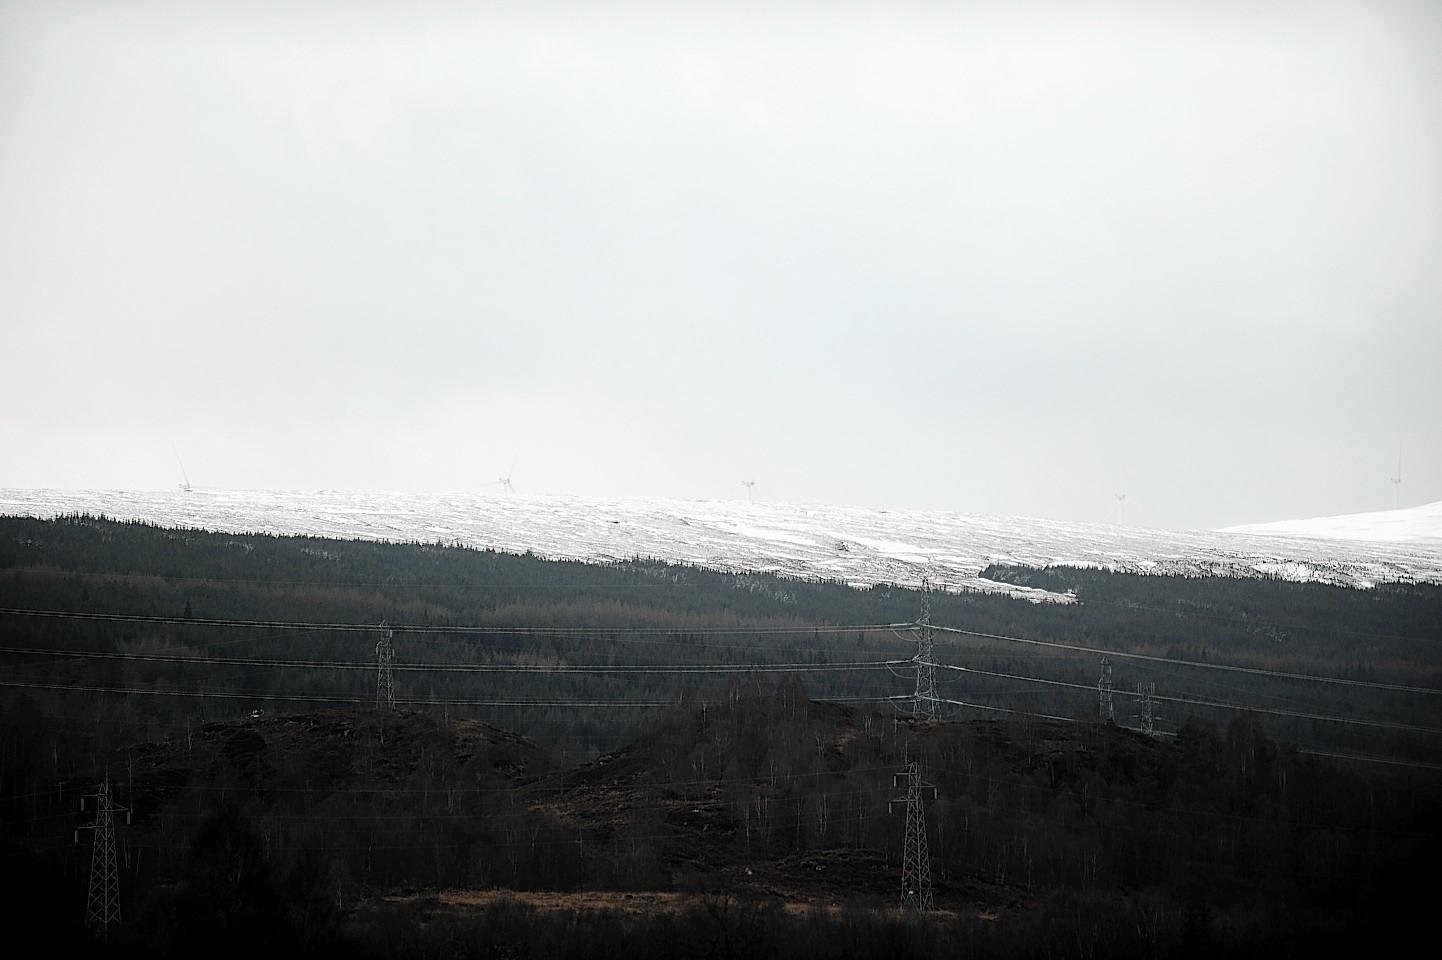 The site of the Millenium wind farm